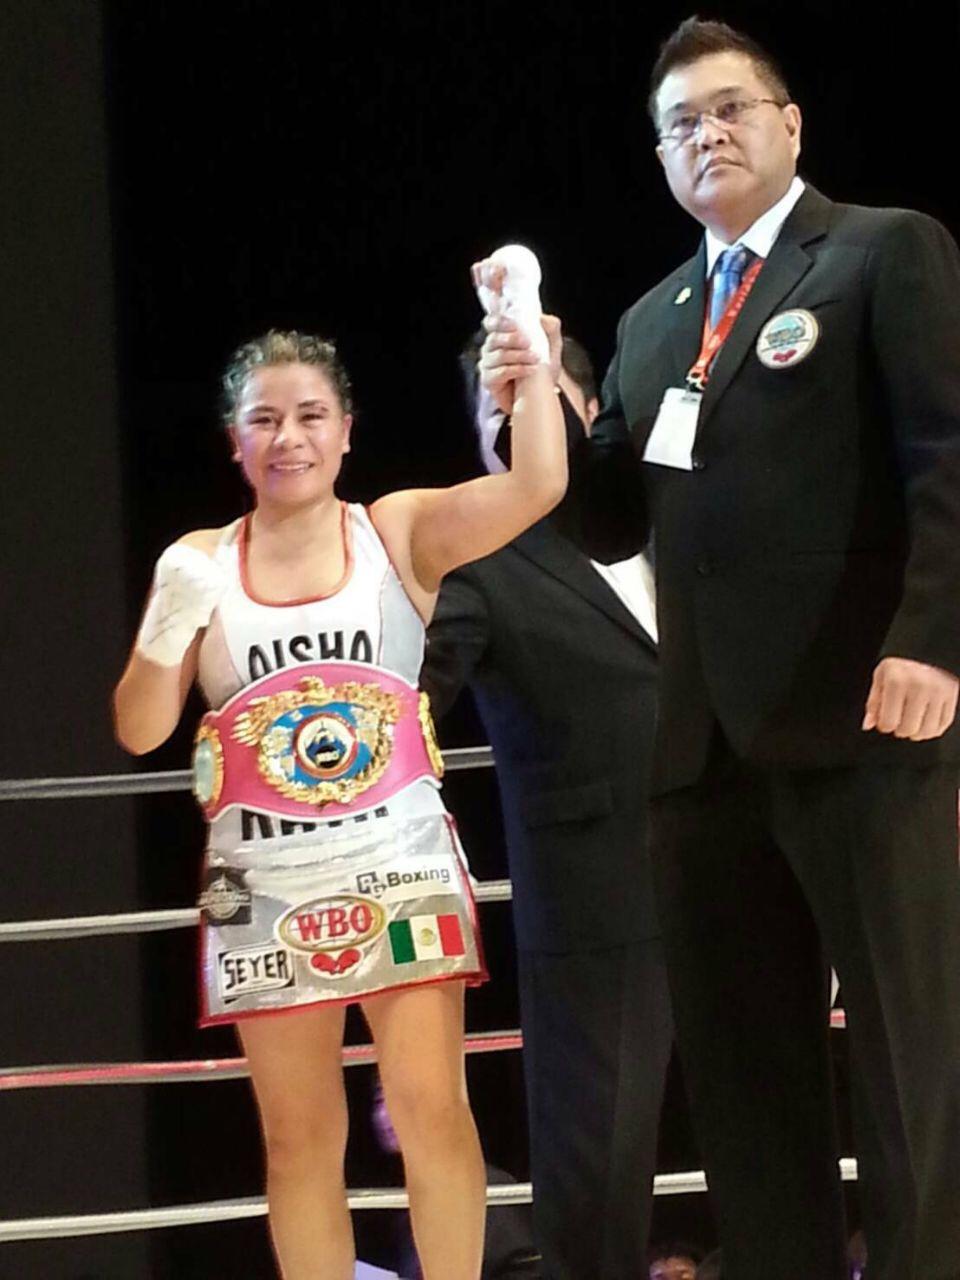 Monserrat Alarcon Boxing Champion